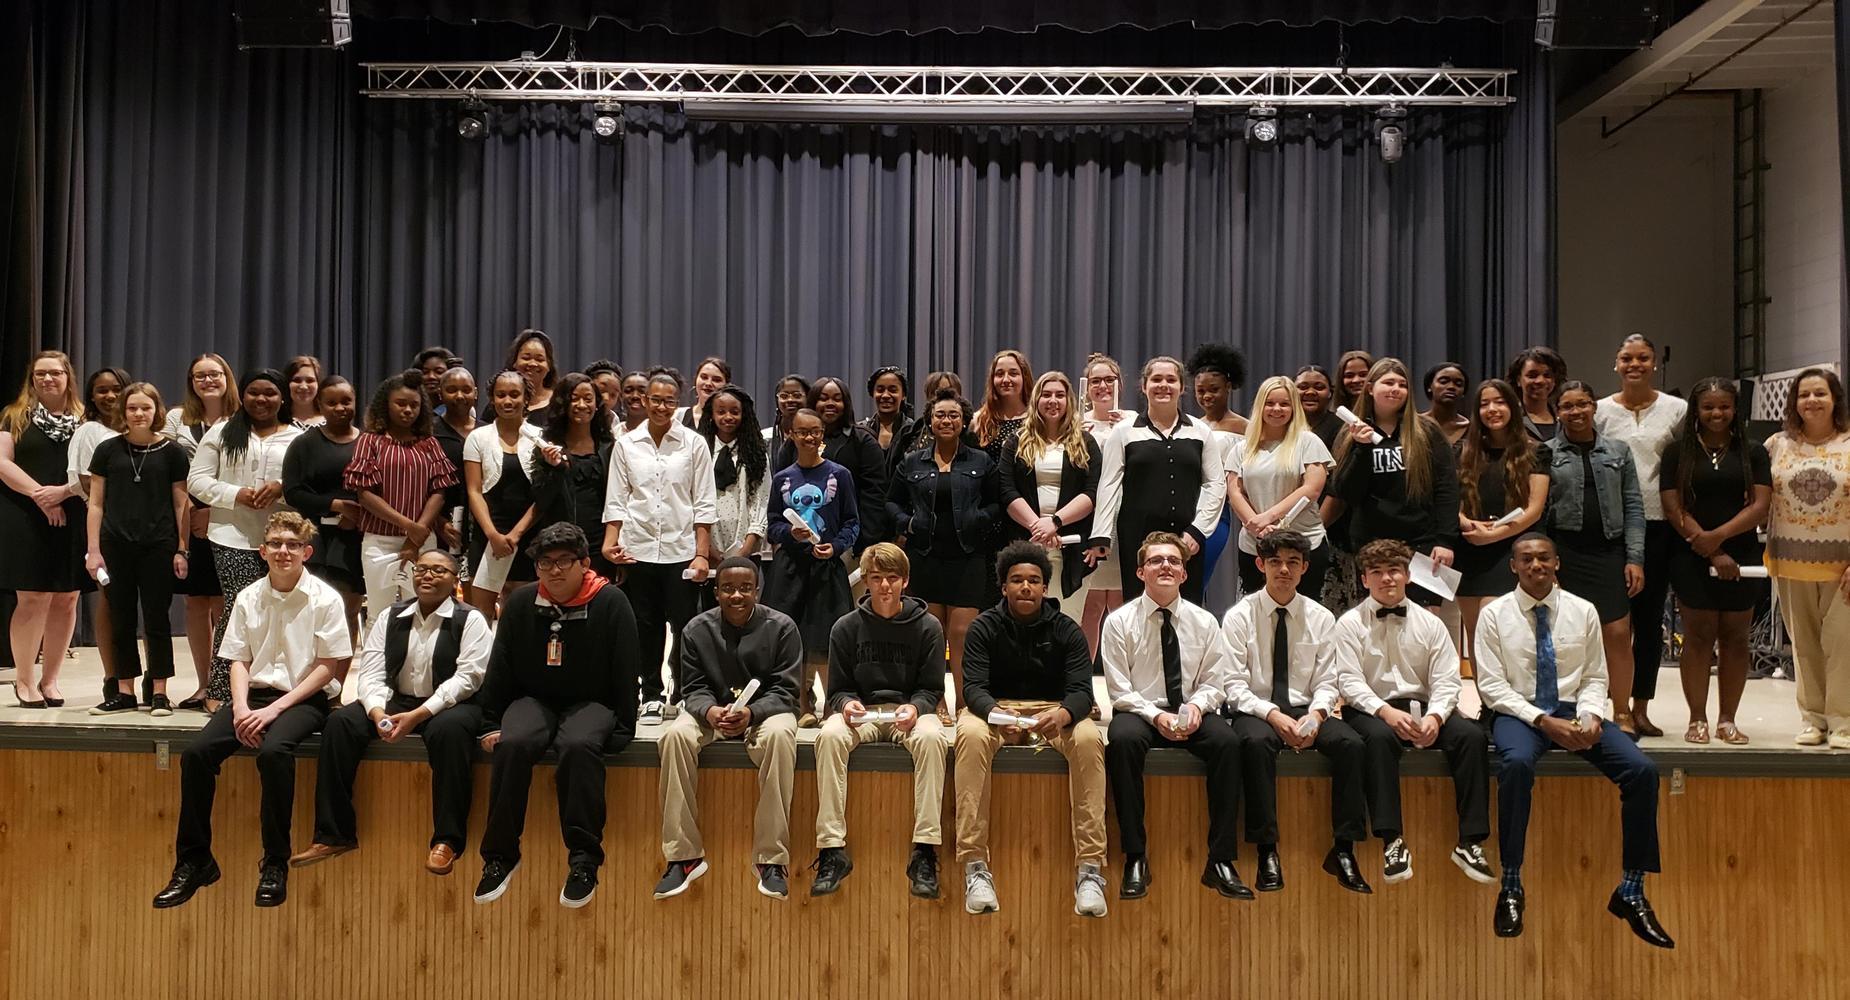 2018-2019 National Honor Society Inductees